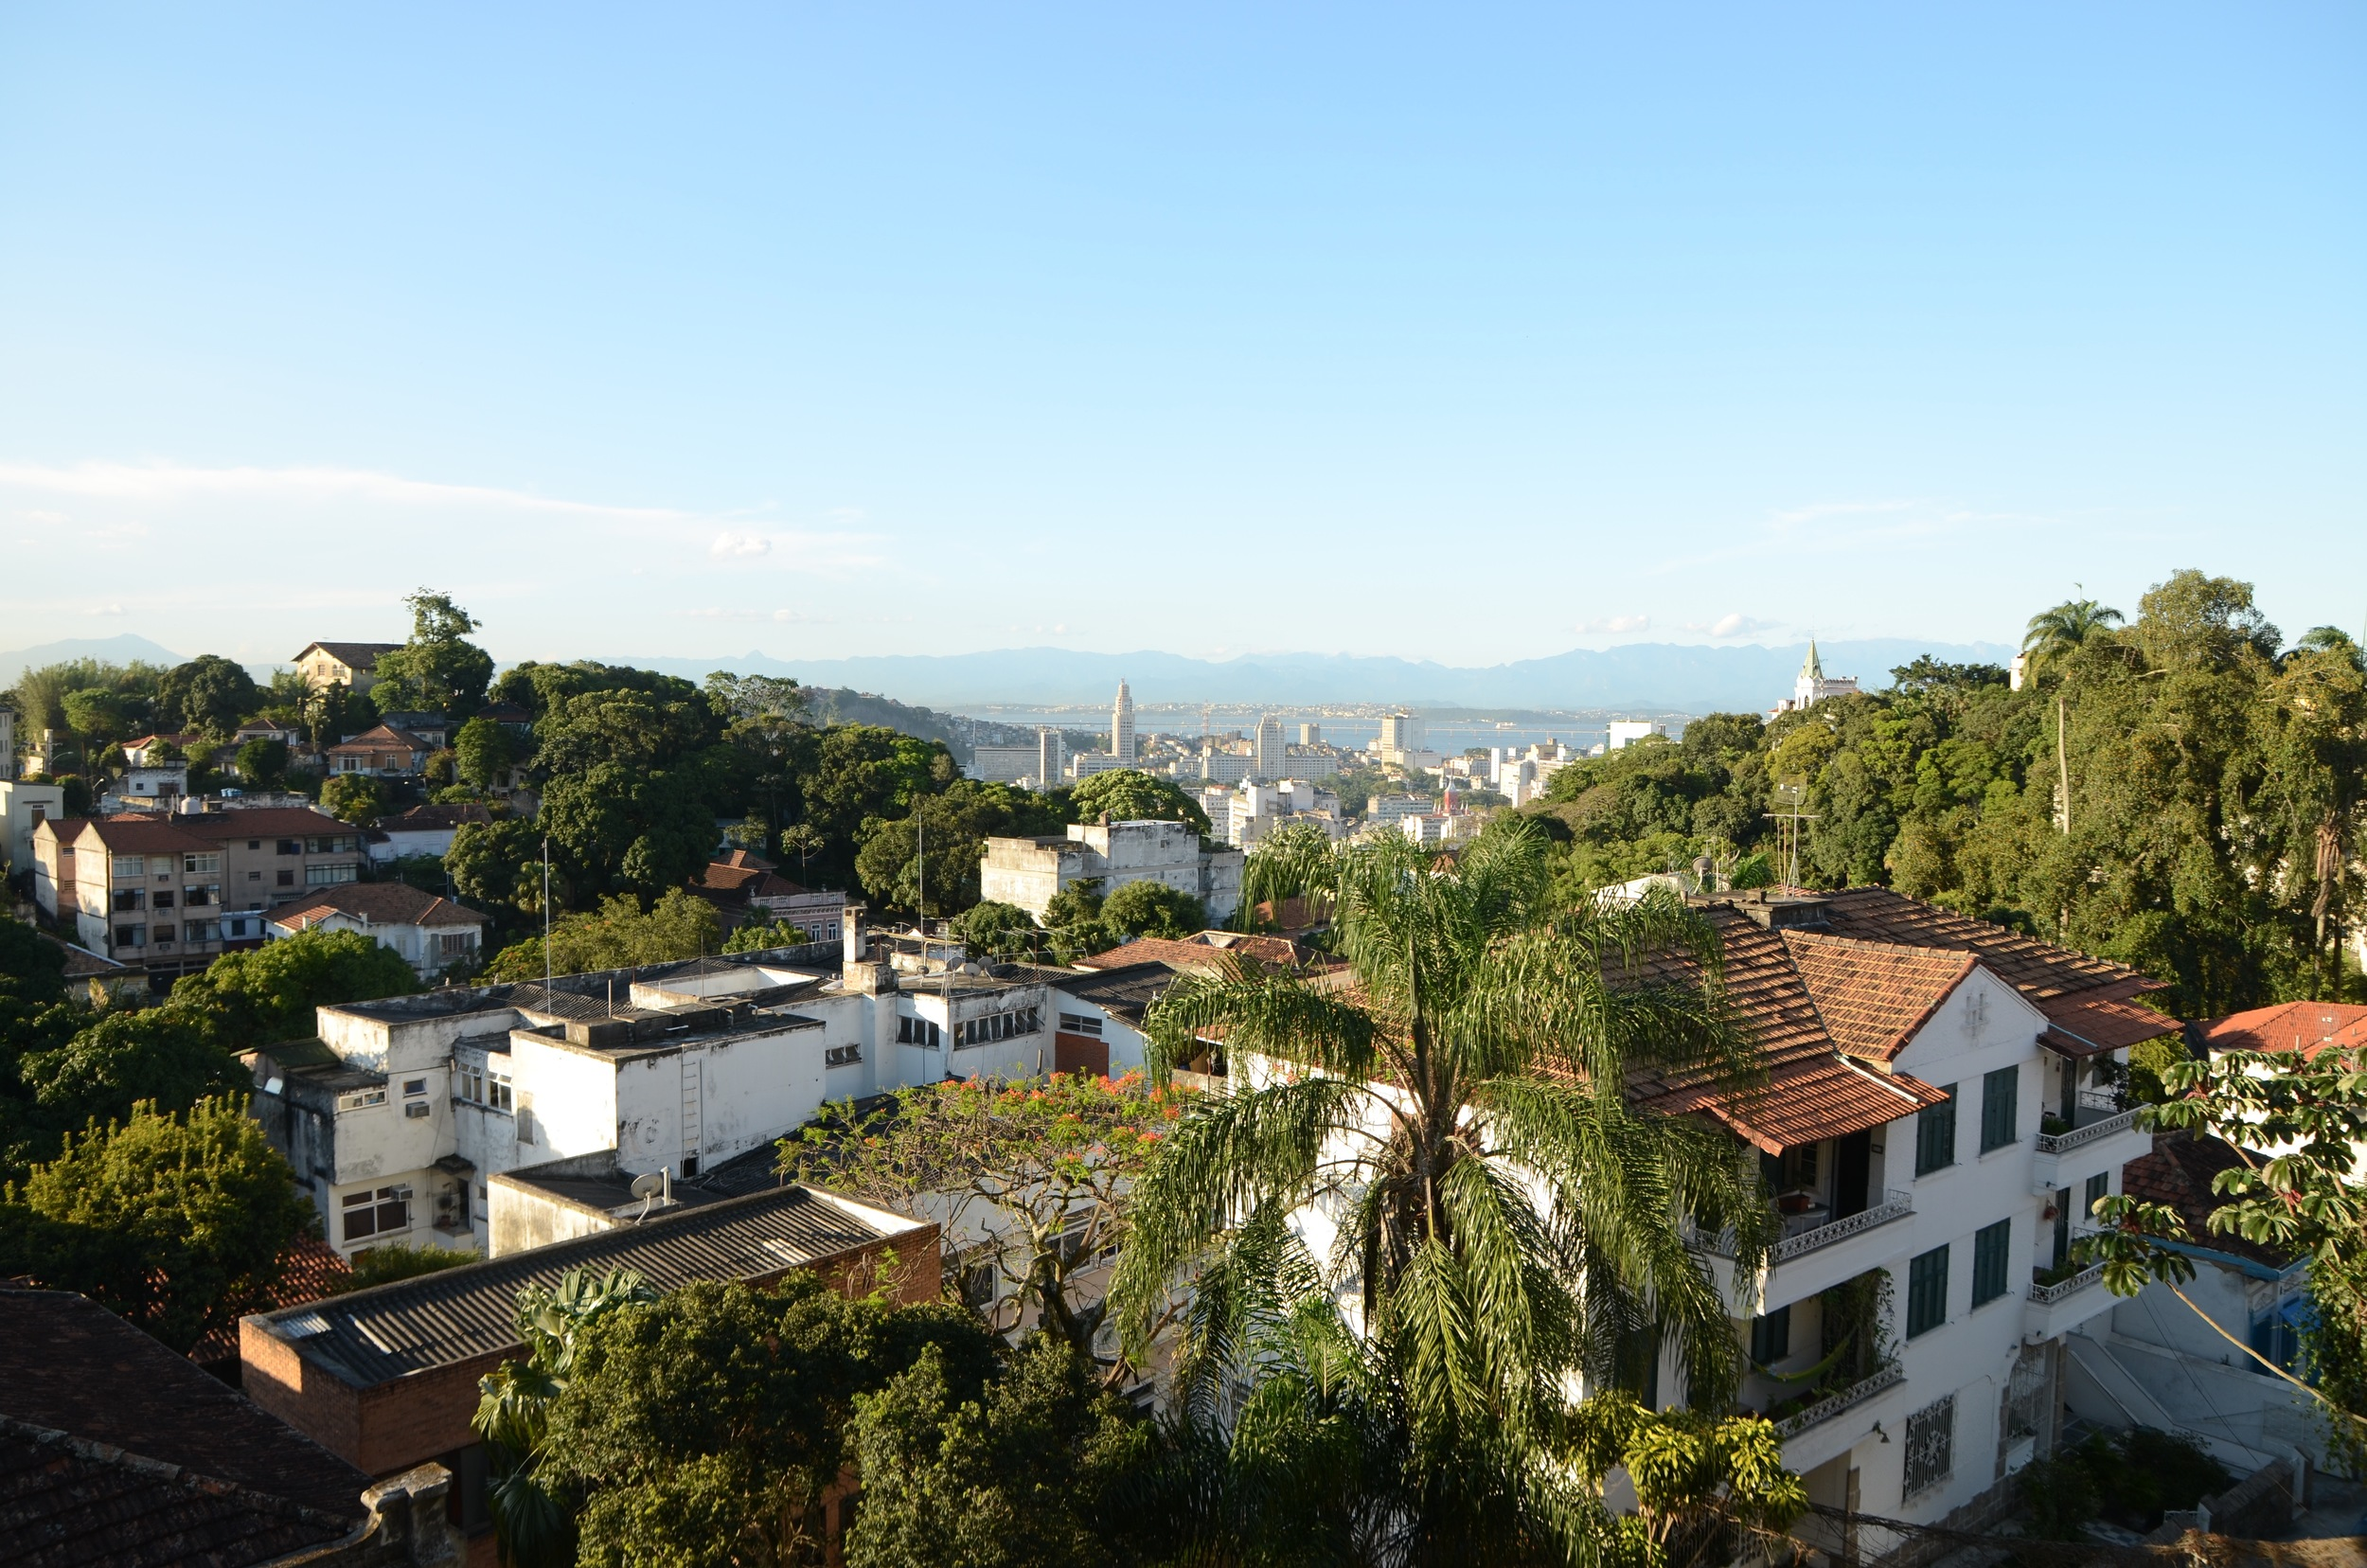 View from Hotel Santa Teresa Rio de Janeiro.jpg